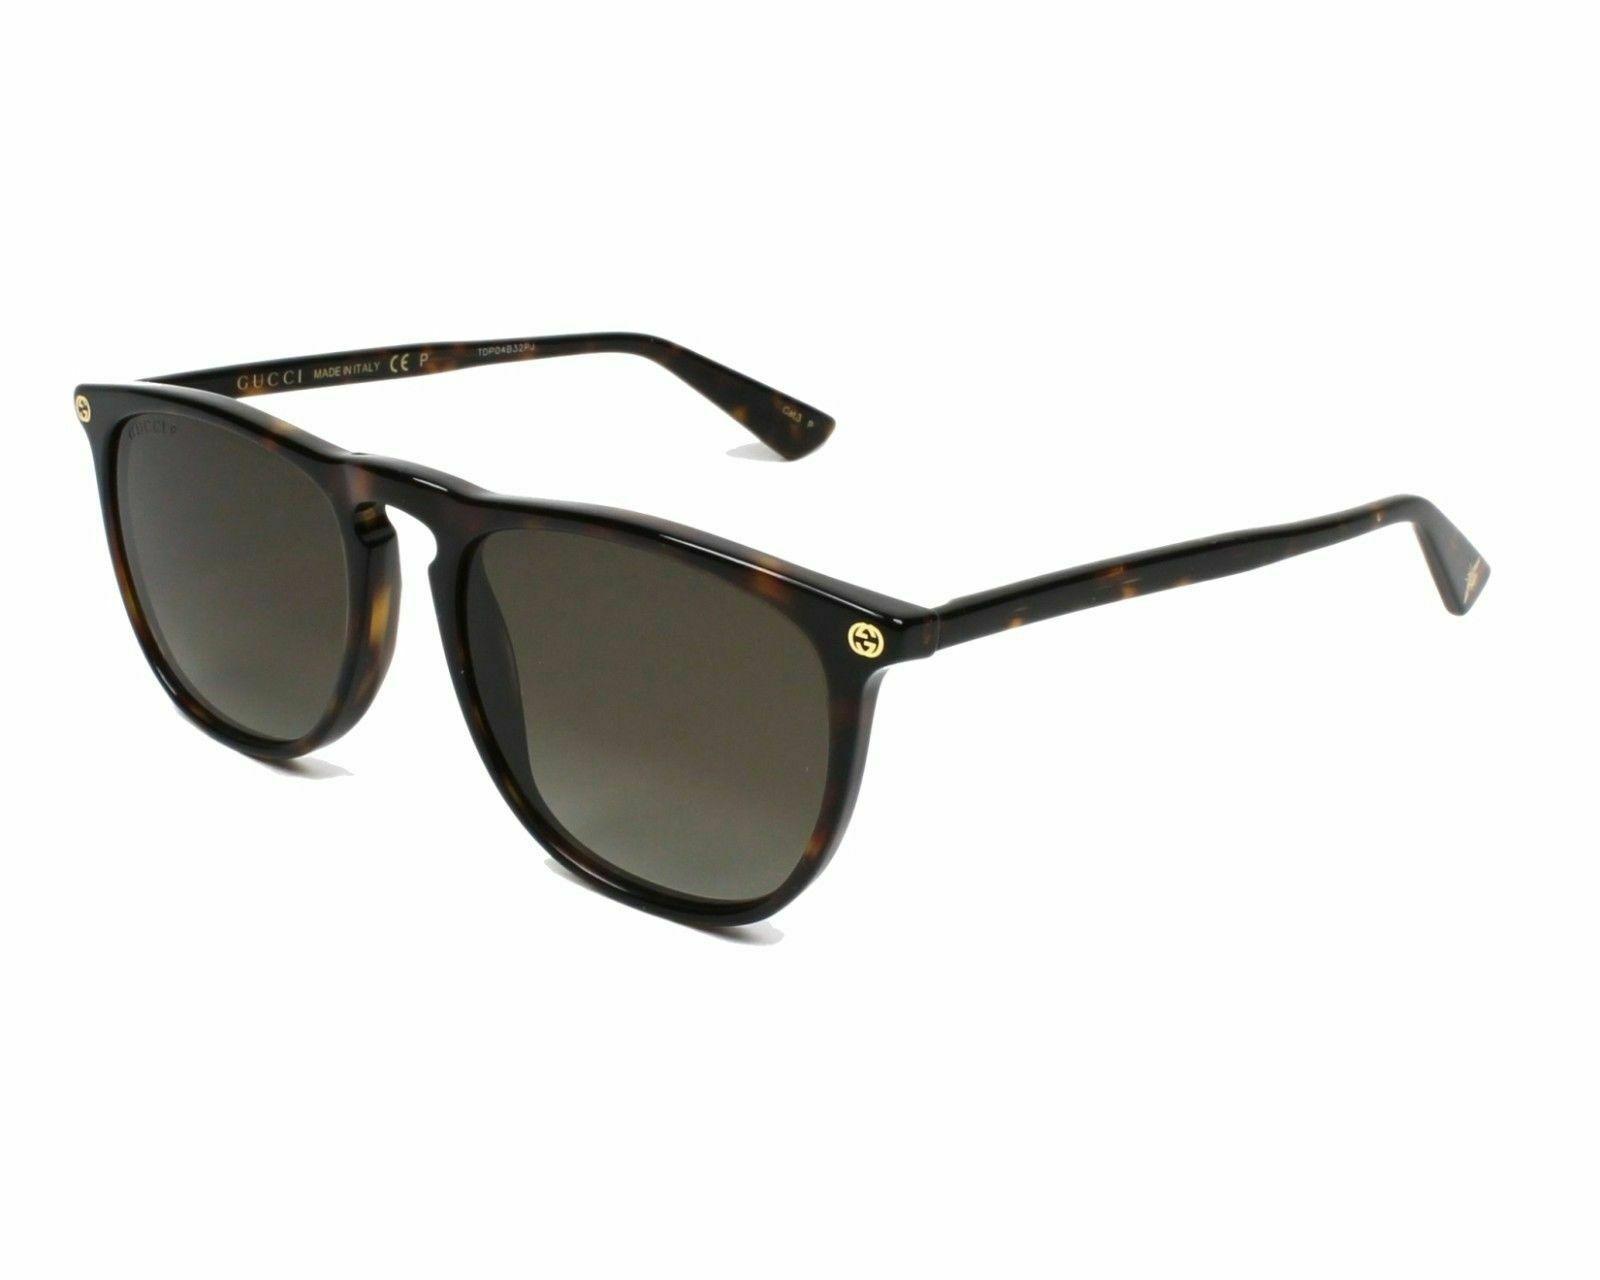 d0a83343f08 Gucci GG0120S 006 Sunglasses Havana Brown Frame Brown Polarized ...